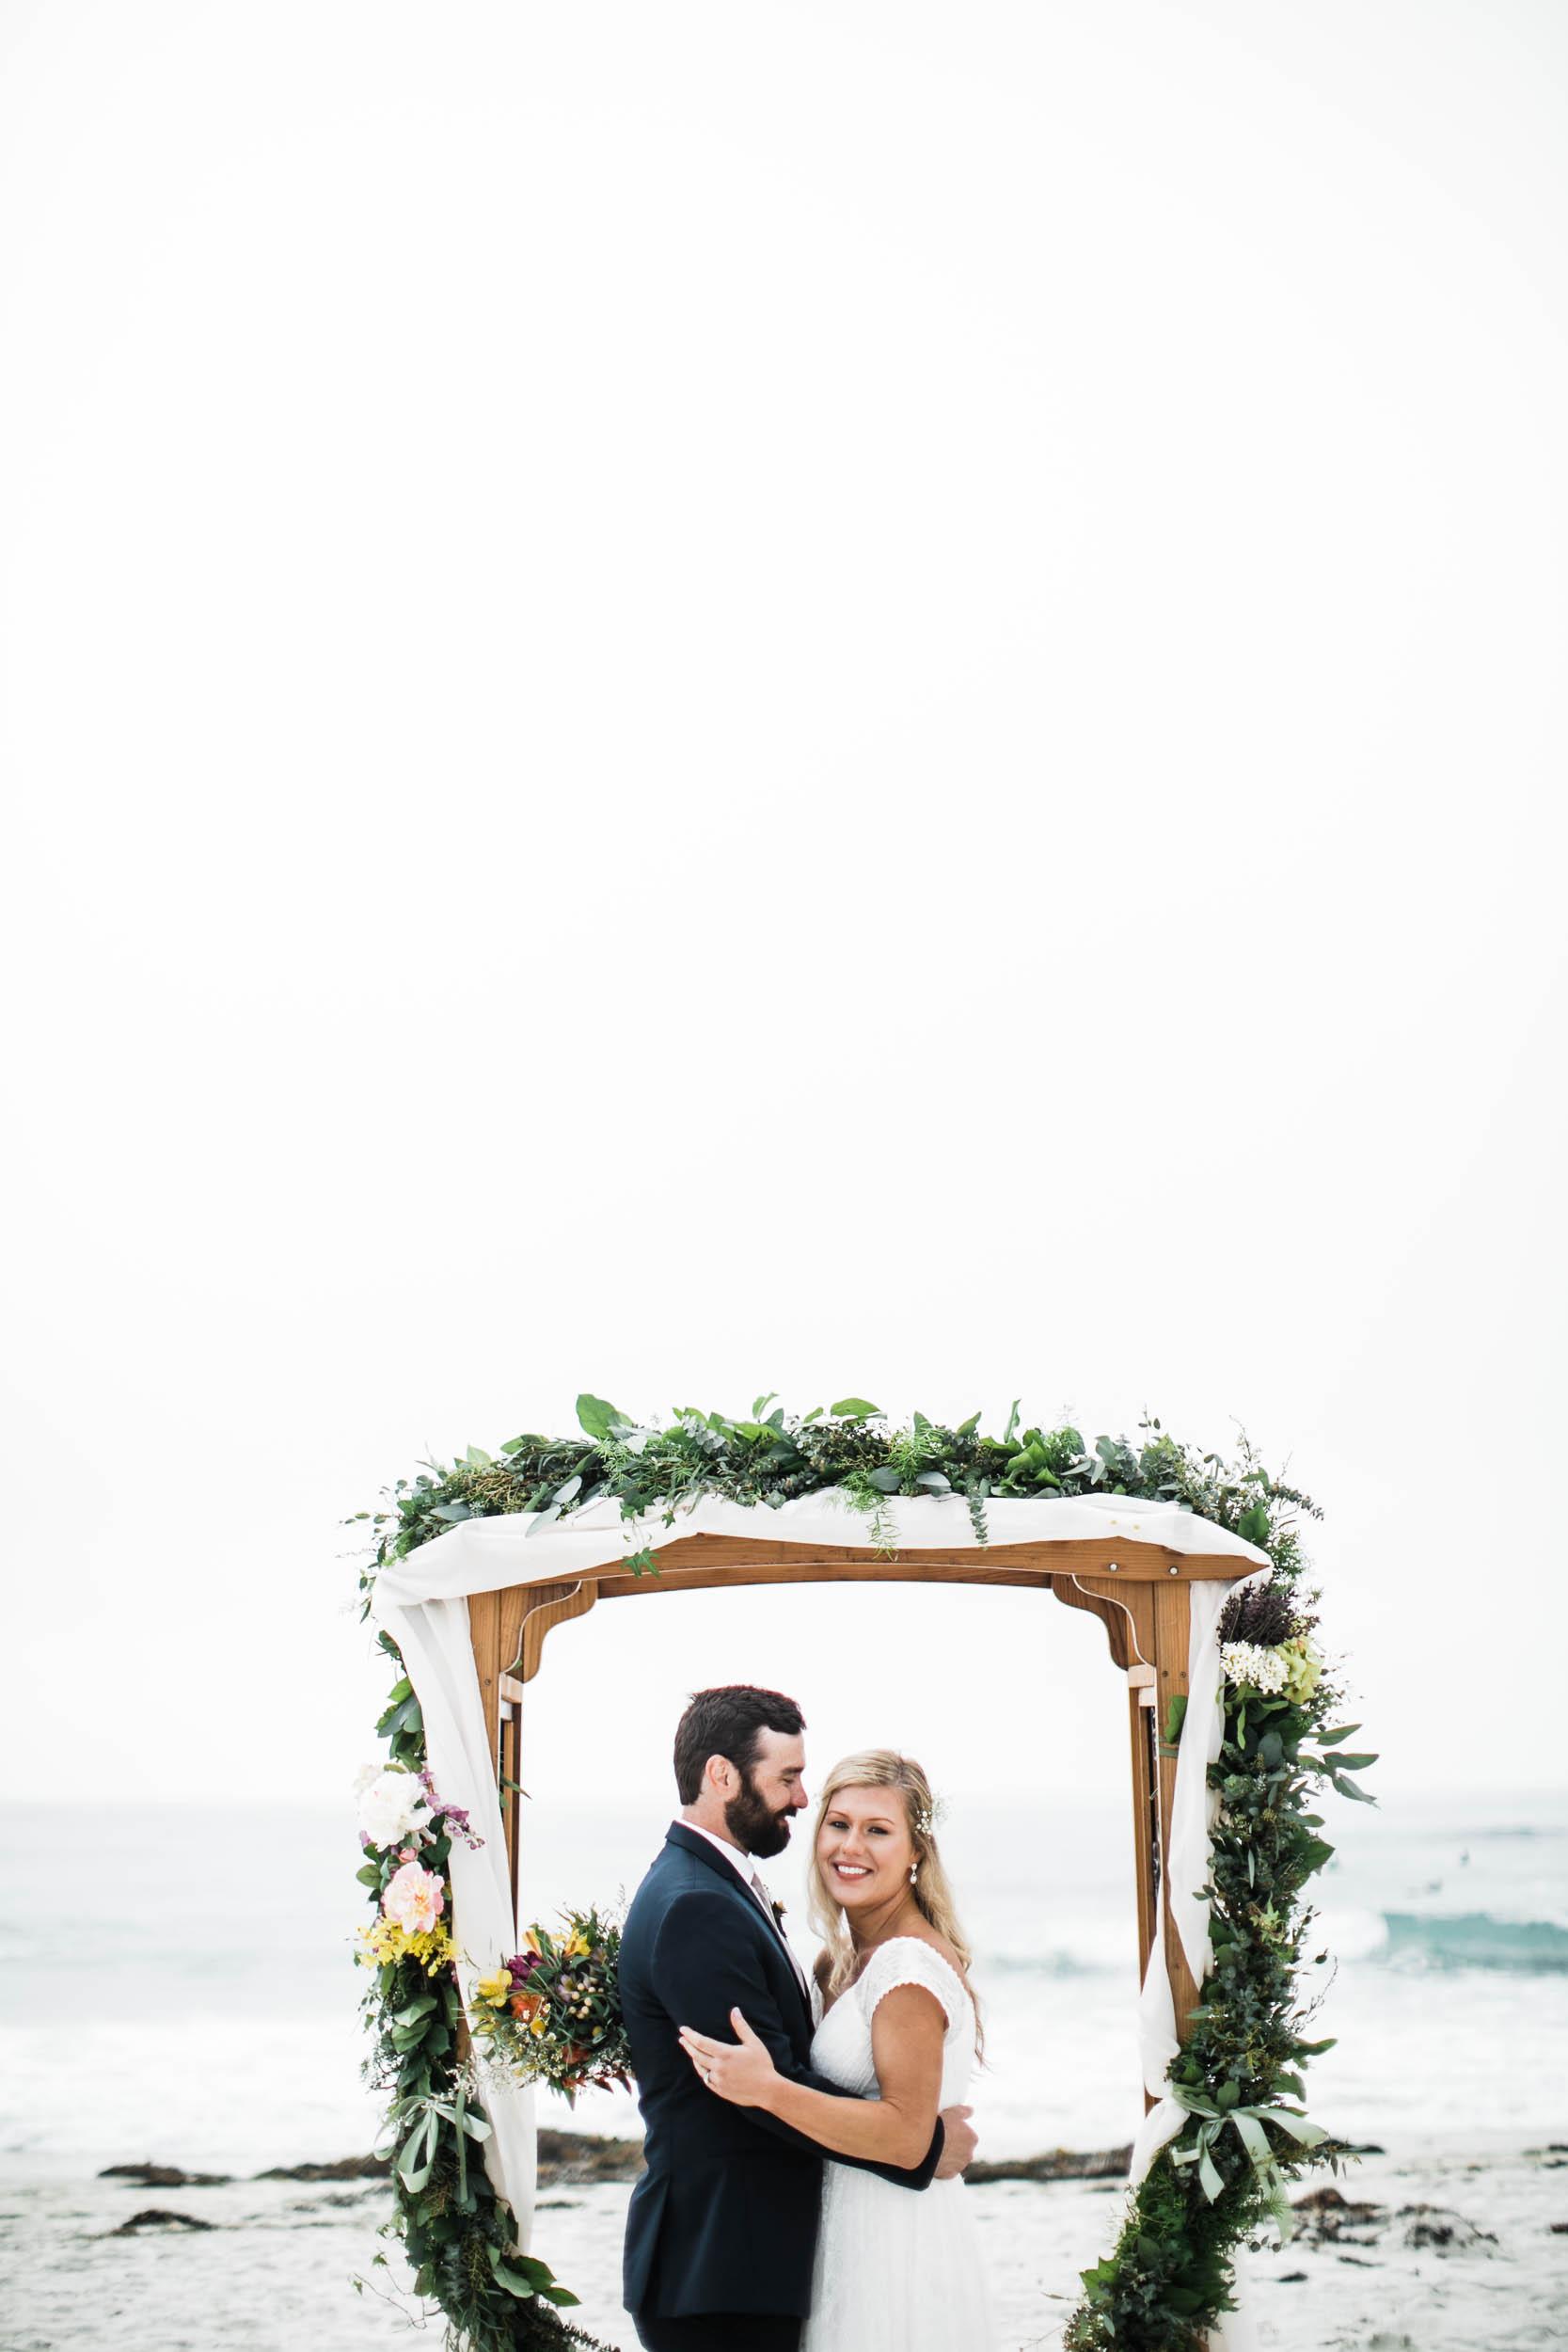 082617_C+K_Asilomar Pacific Grove Wedding_Buena Lane Photography_2679ER.jpg